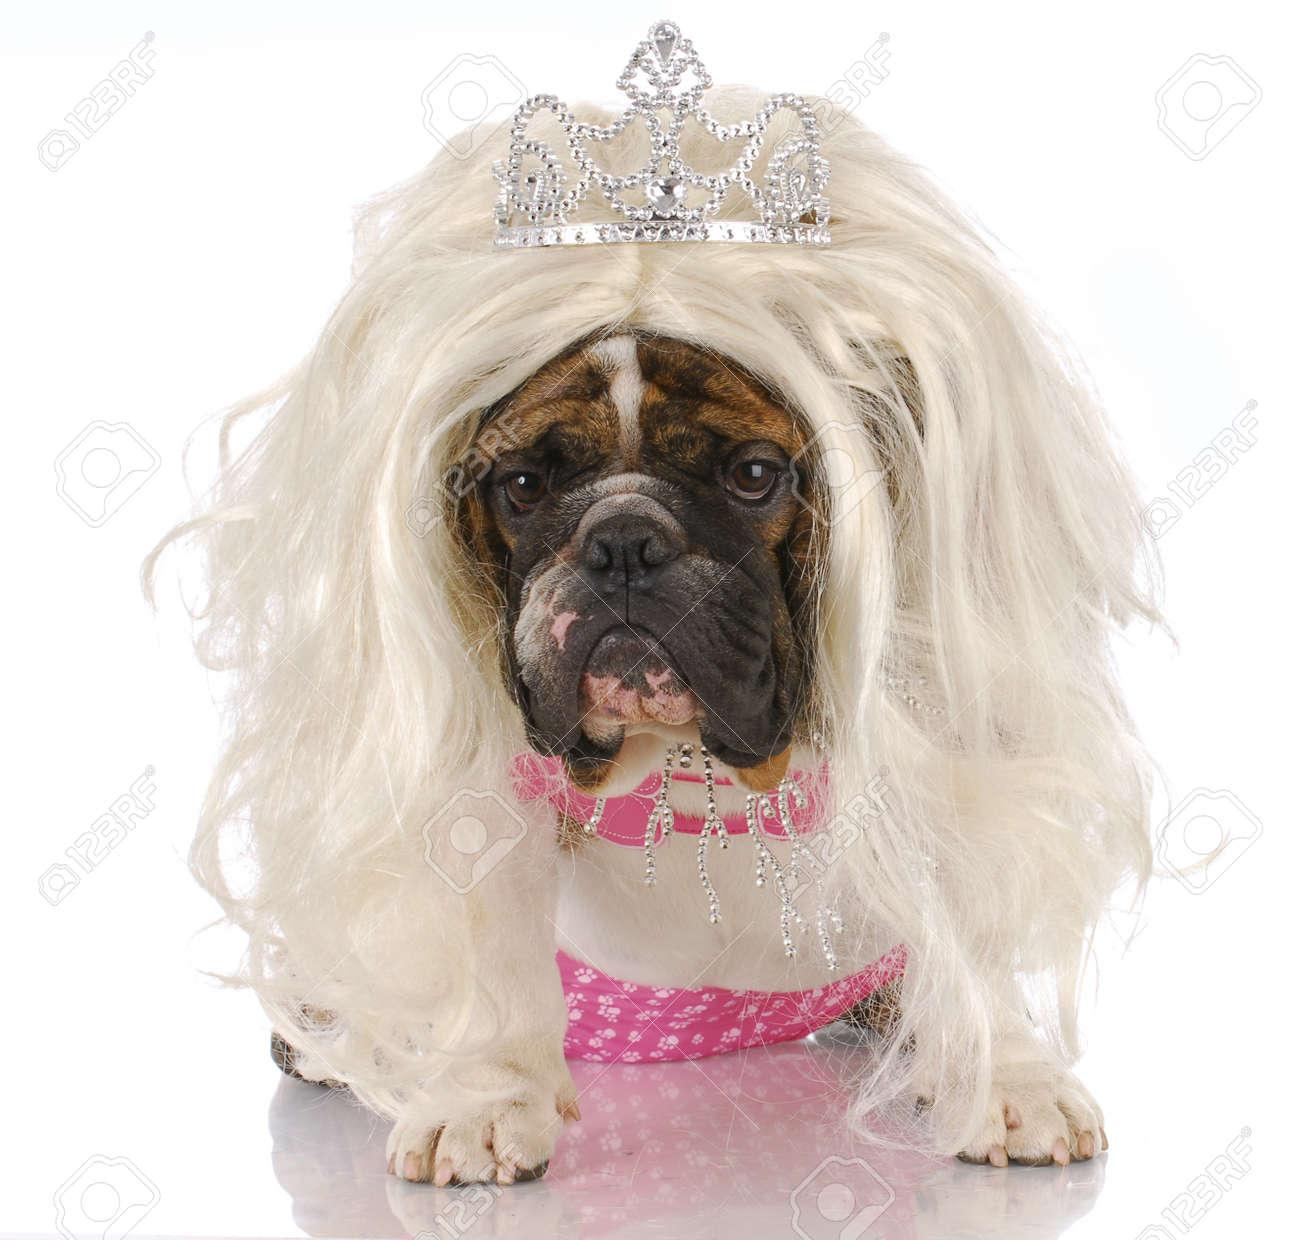 English Bulldog Dressed up